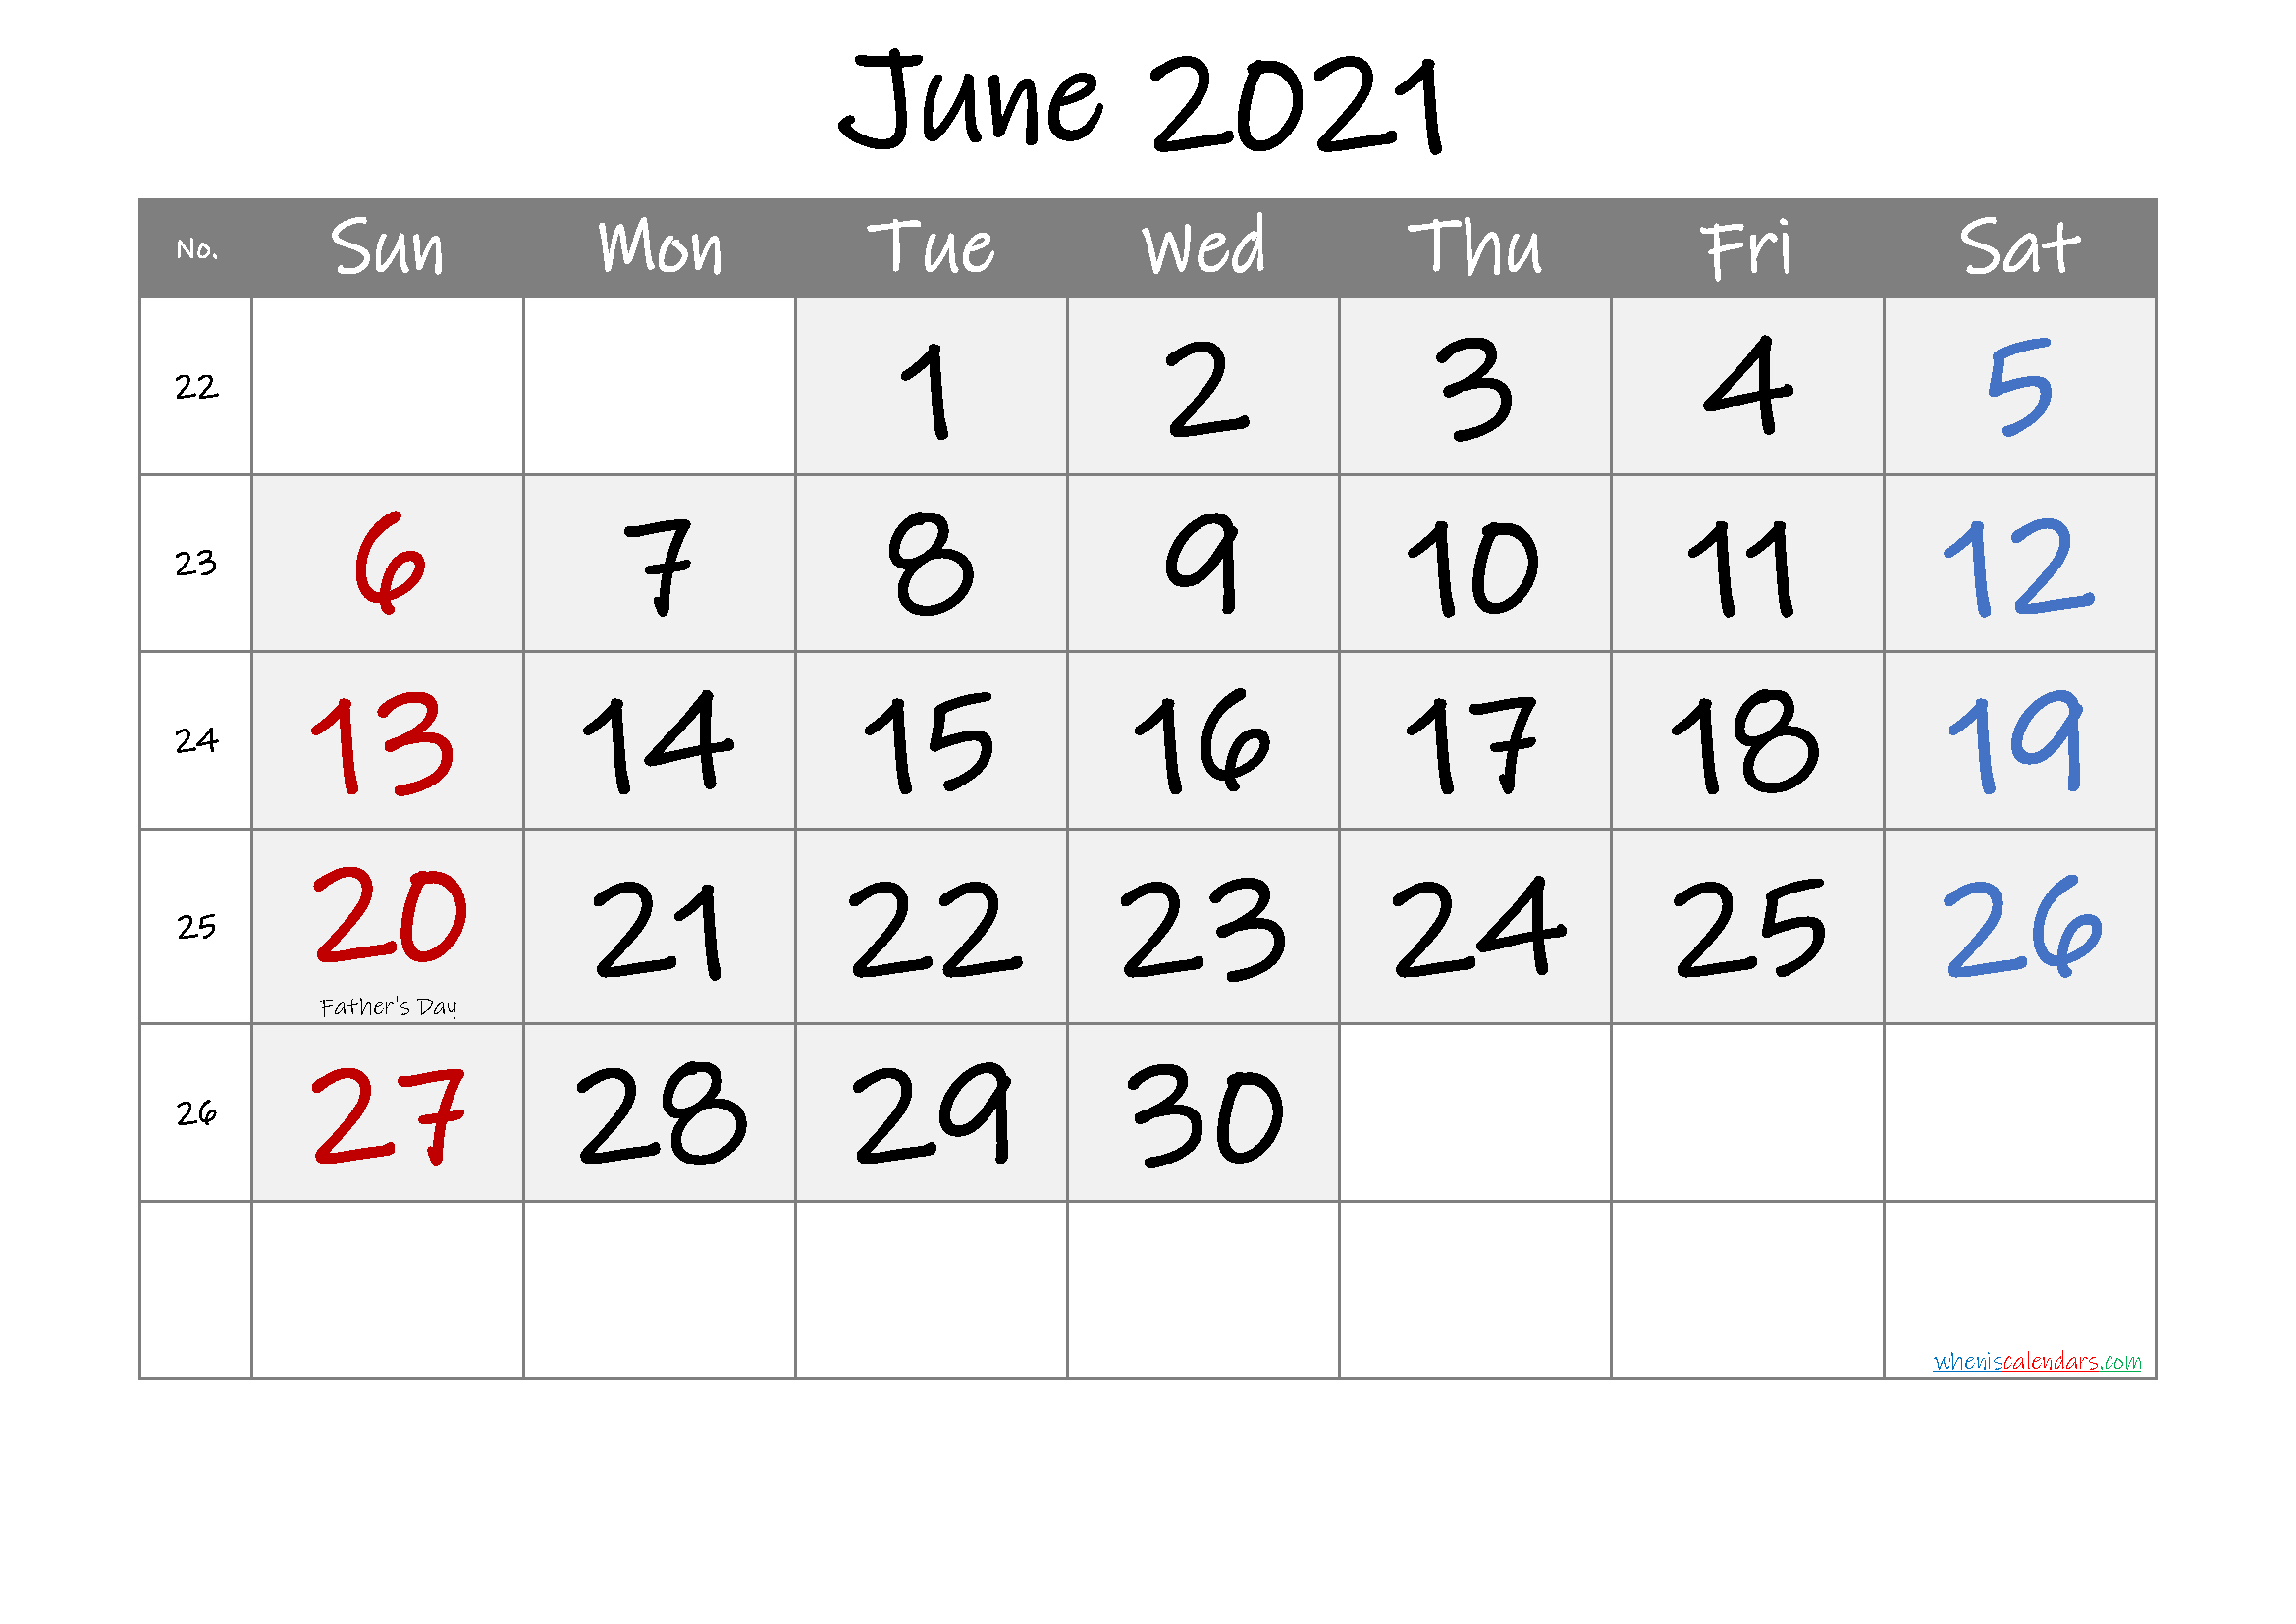 Printable June 2021 Calendar with Holidays - Free ...